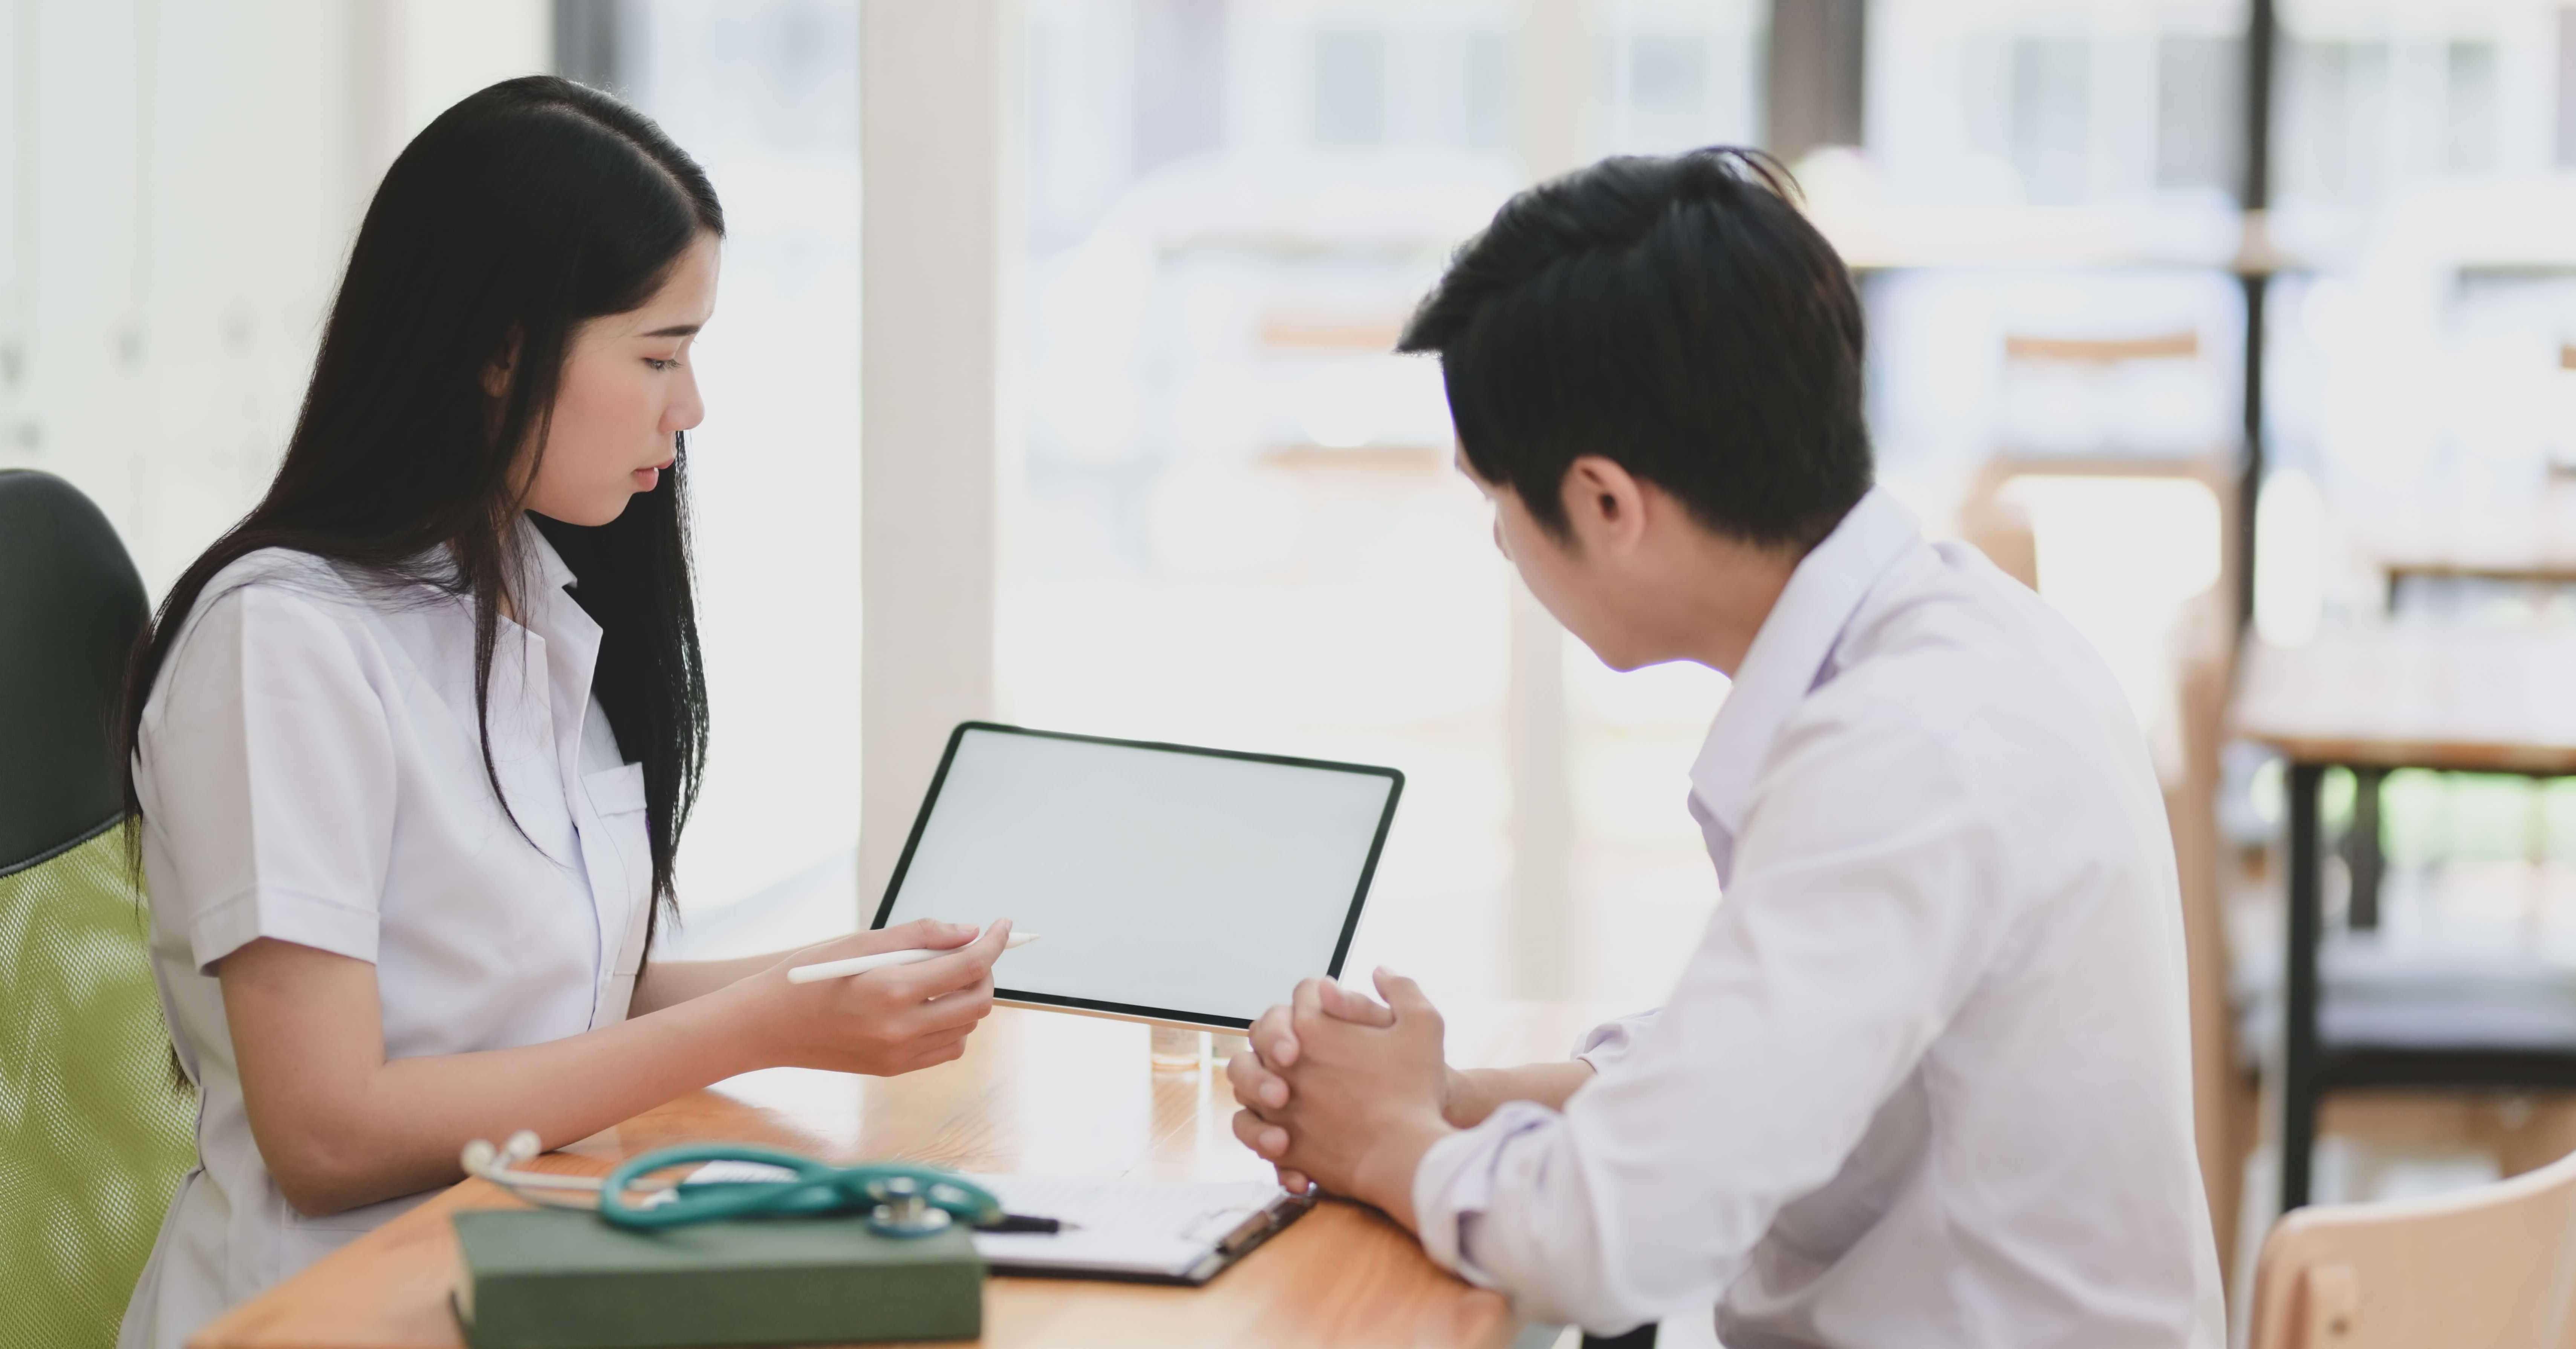 educating through patient empowerment